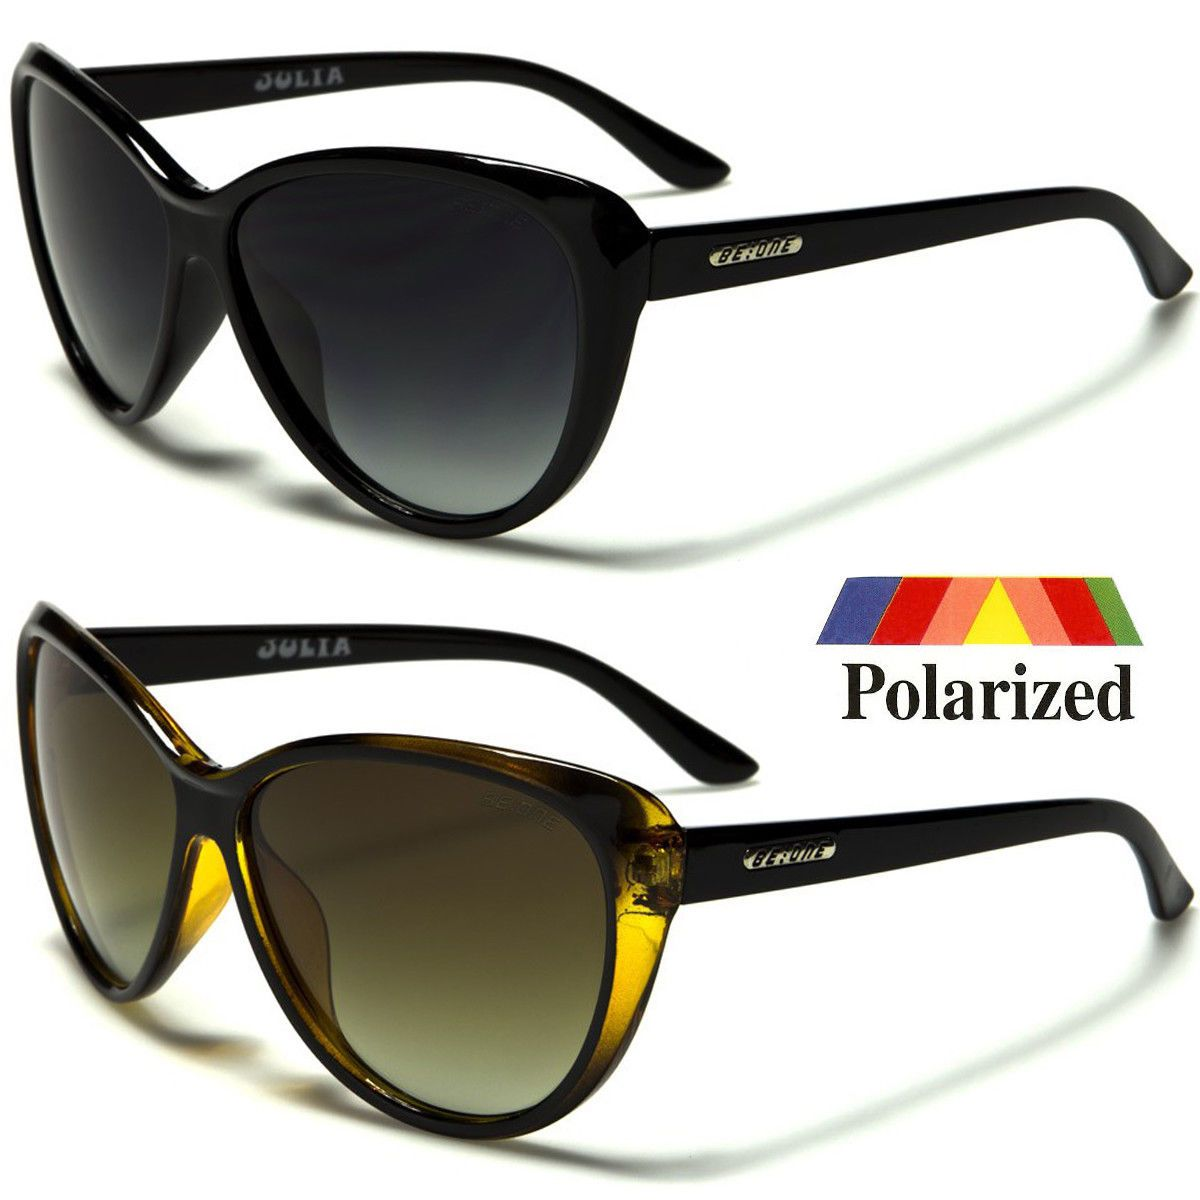 8f04e76ff66 Black Cat Eye POLARIZED Sunglasses Retro Classic Vintage Design Women s  Fashion  7.99 End Date  2019